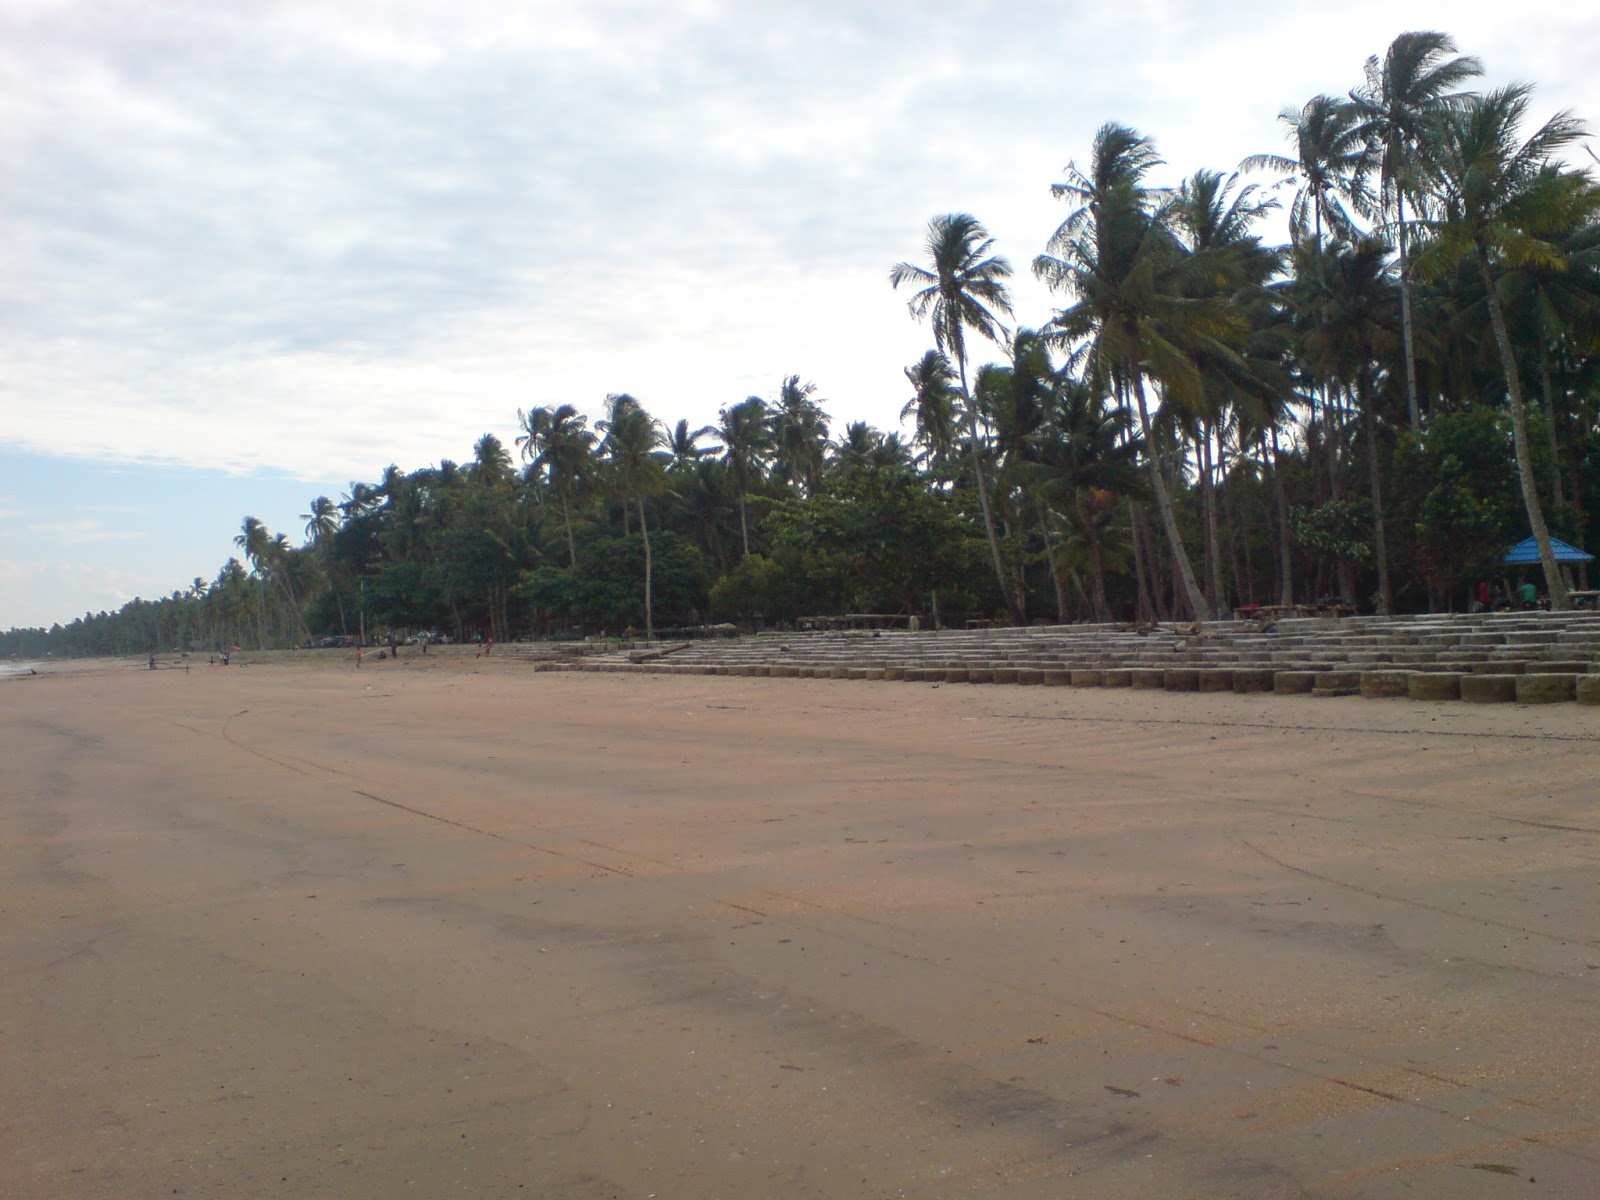 pantai tanjung jumlai penajam paser utara